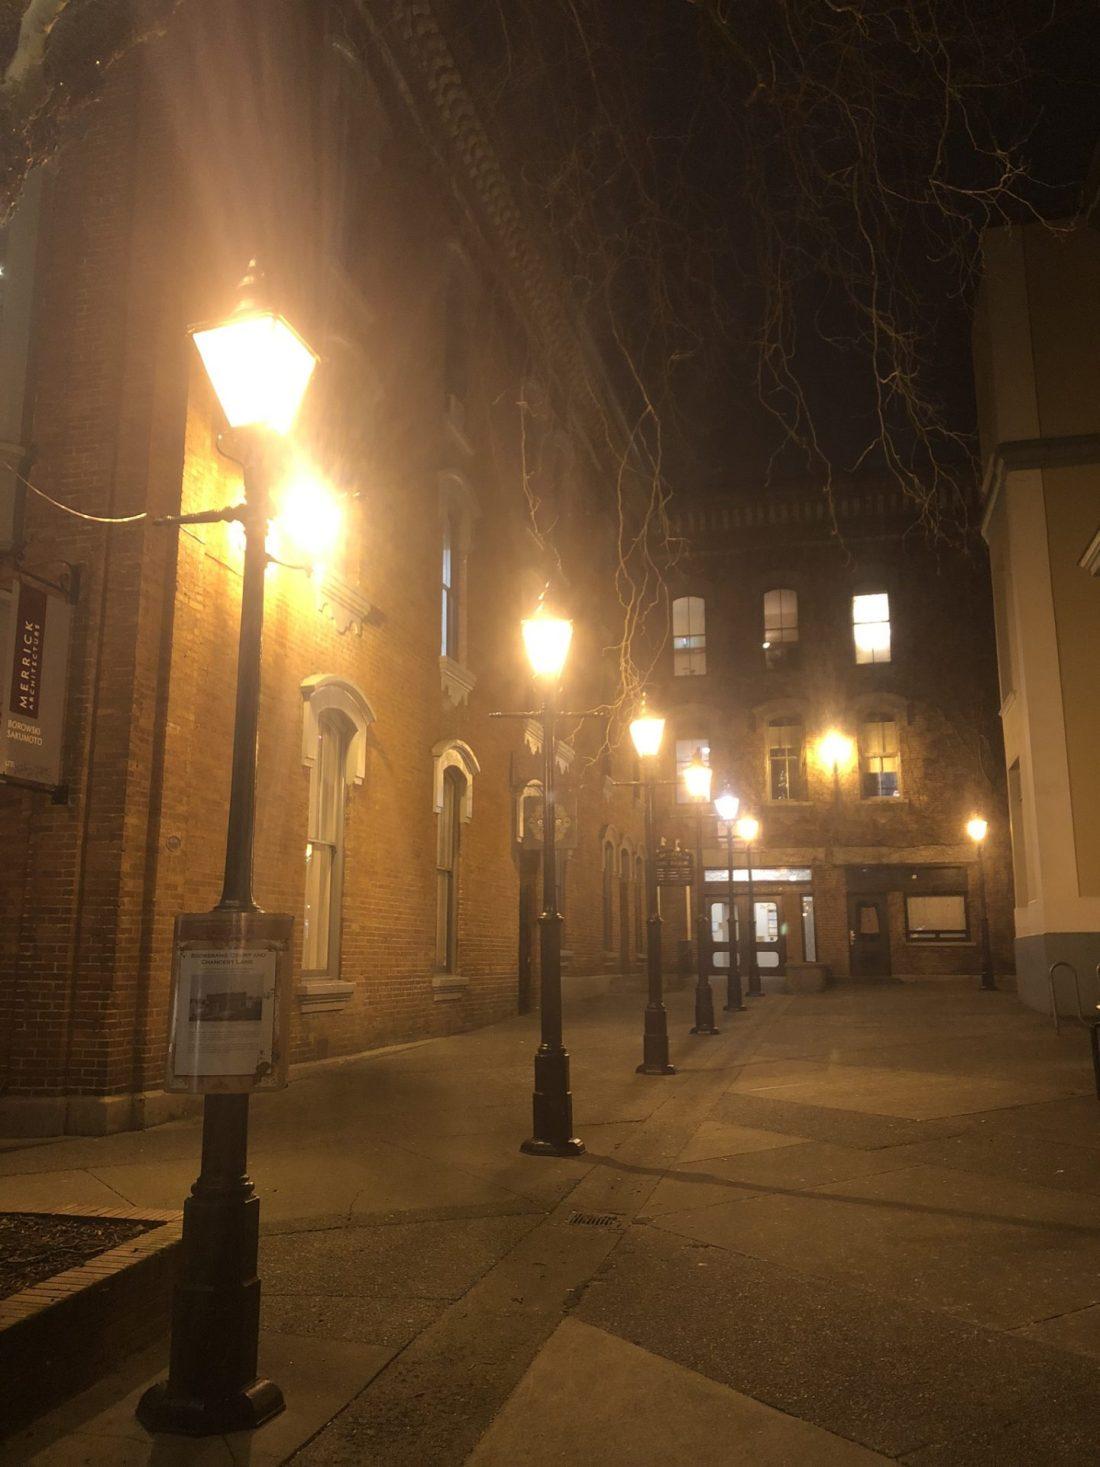 Gas lamps and historic architecture in Victoria, British Columbia